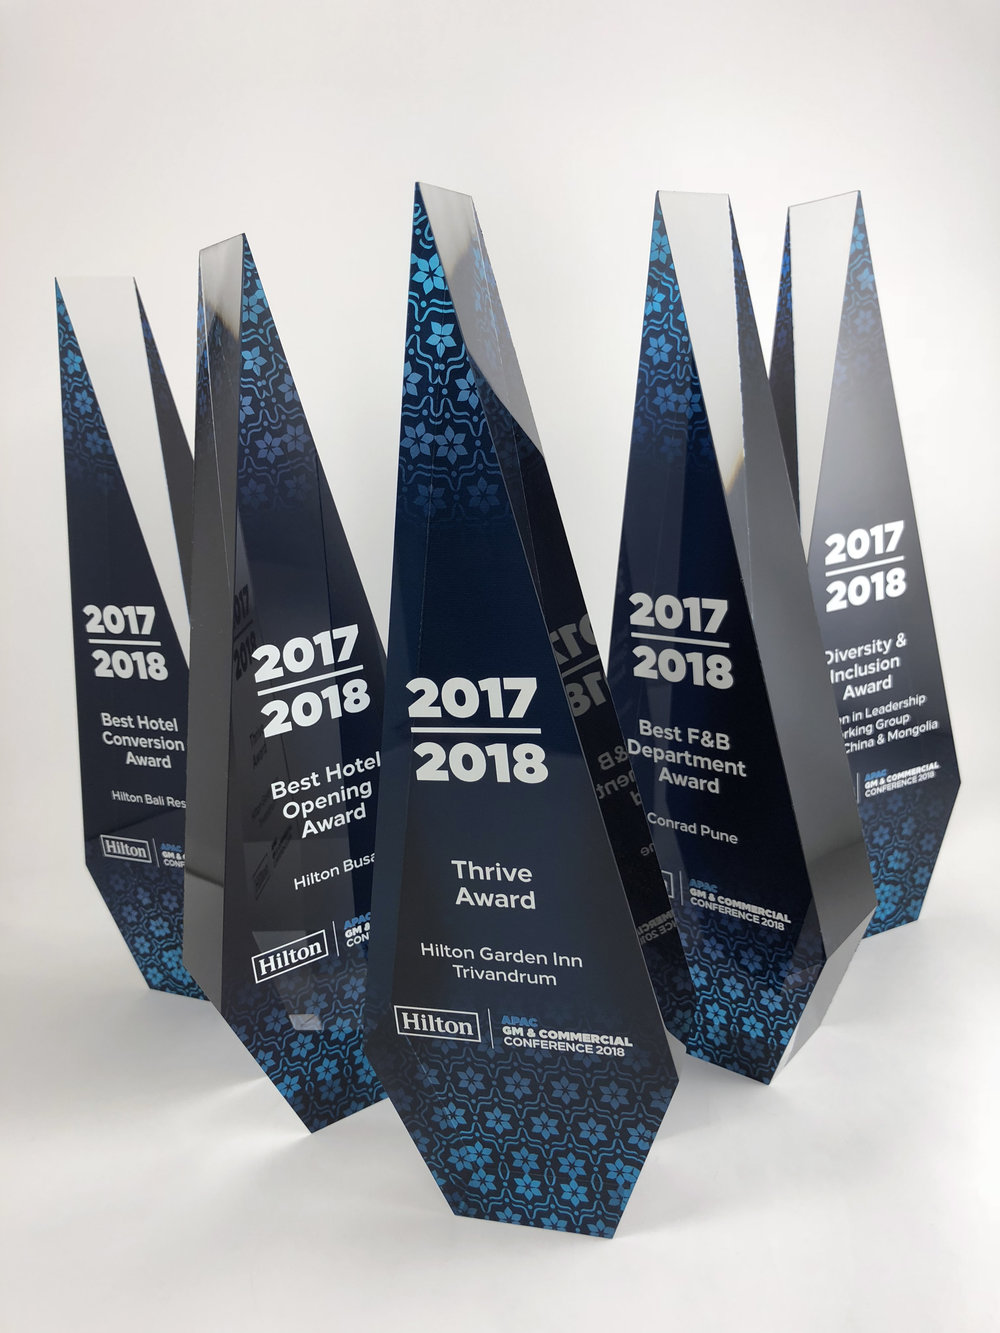 hilton-apac-awards-acrylic-trophy-05.jpg